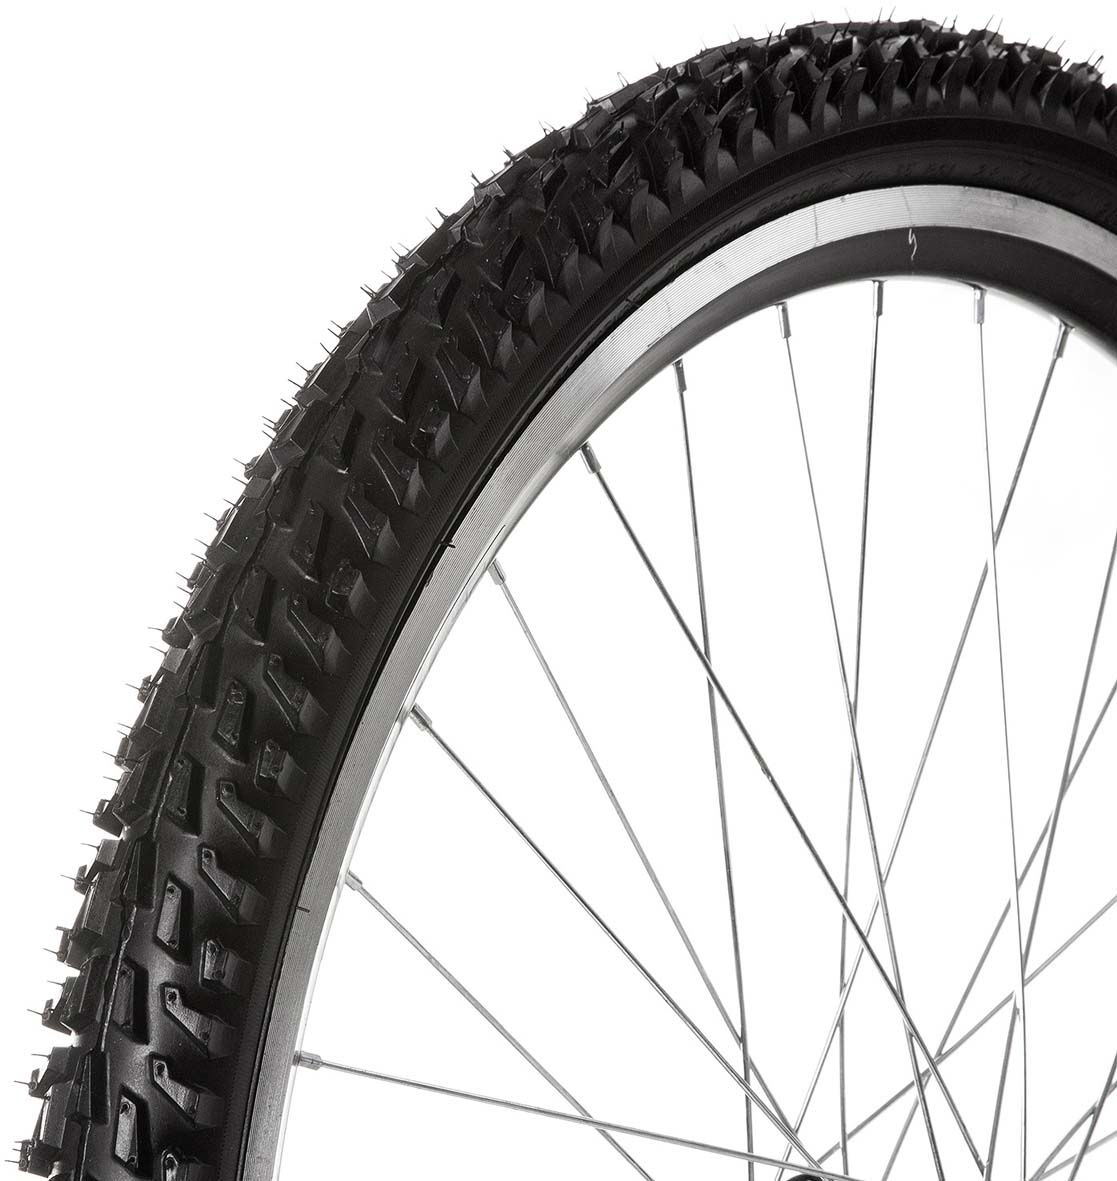 Покрышка высокая Kenda 26х1.95 5-527604 (50-559) K837 kenda high quality mtb folding bicycle tire mountain bike tyre tires 26 27 5 29x1 95 2 1 2 35 bike parts accessories